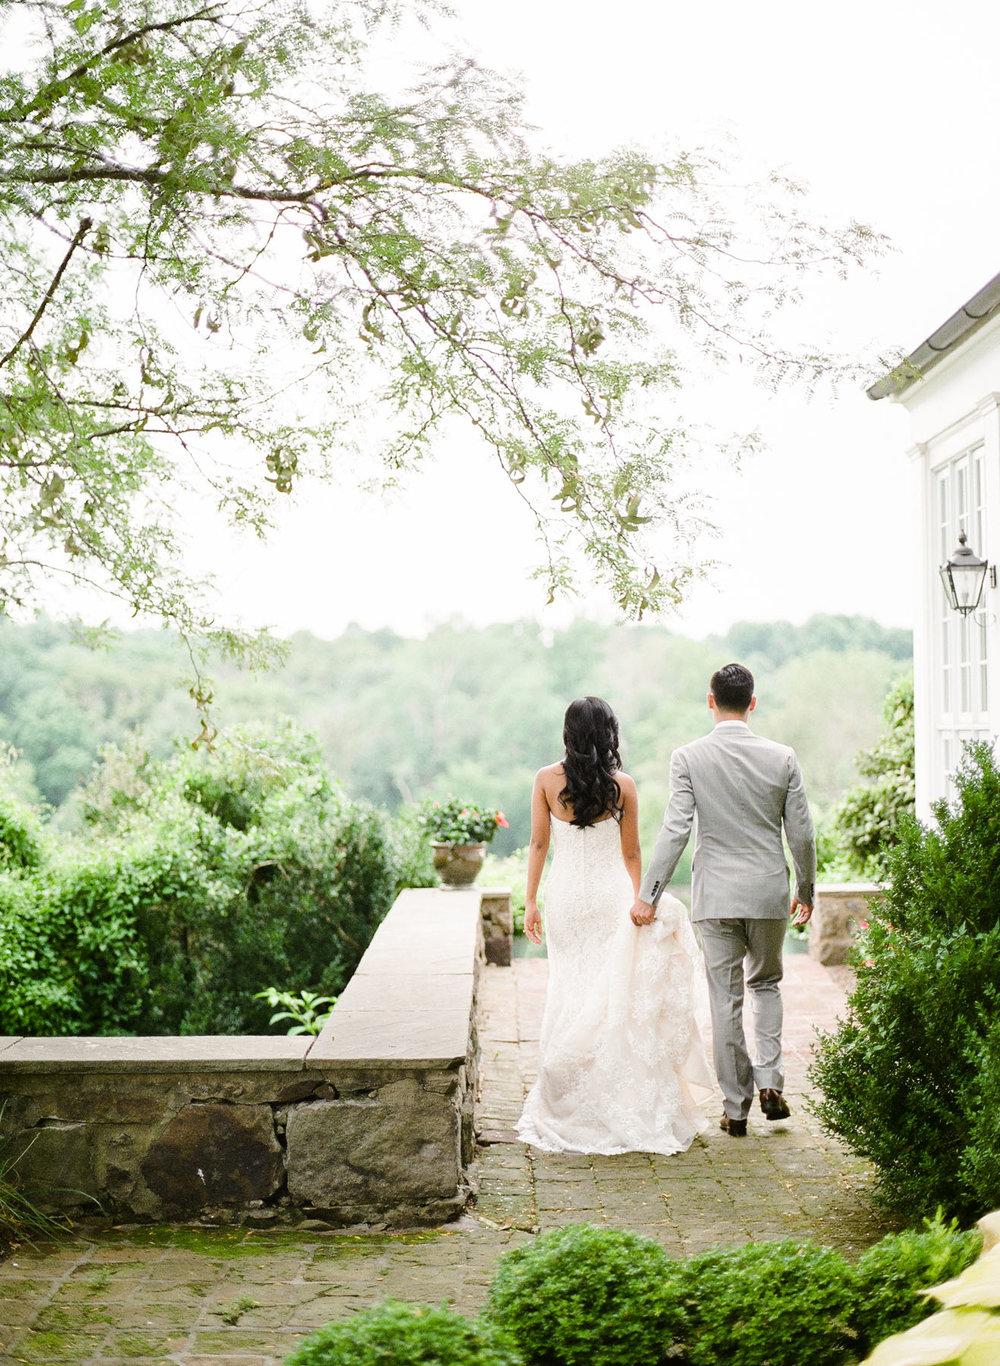 Virginia-Film-Photographer-Wedding-45.jpg